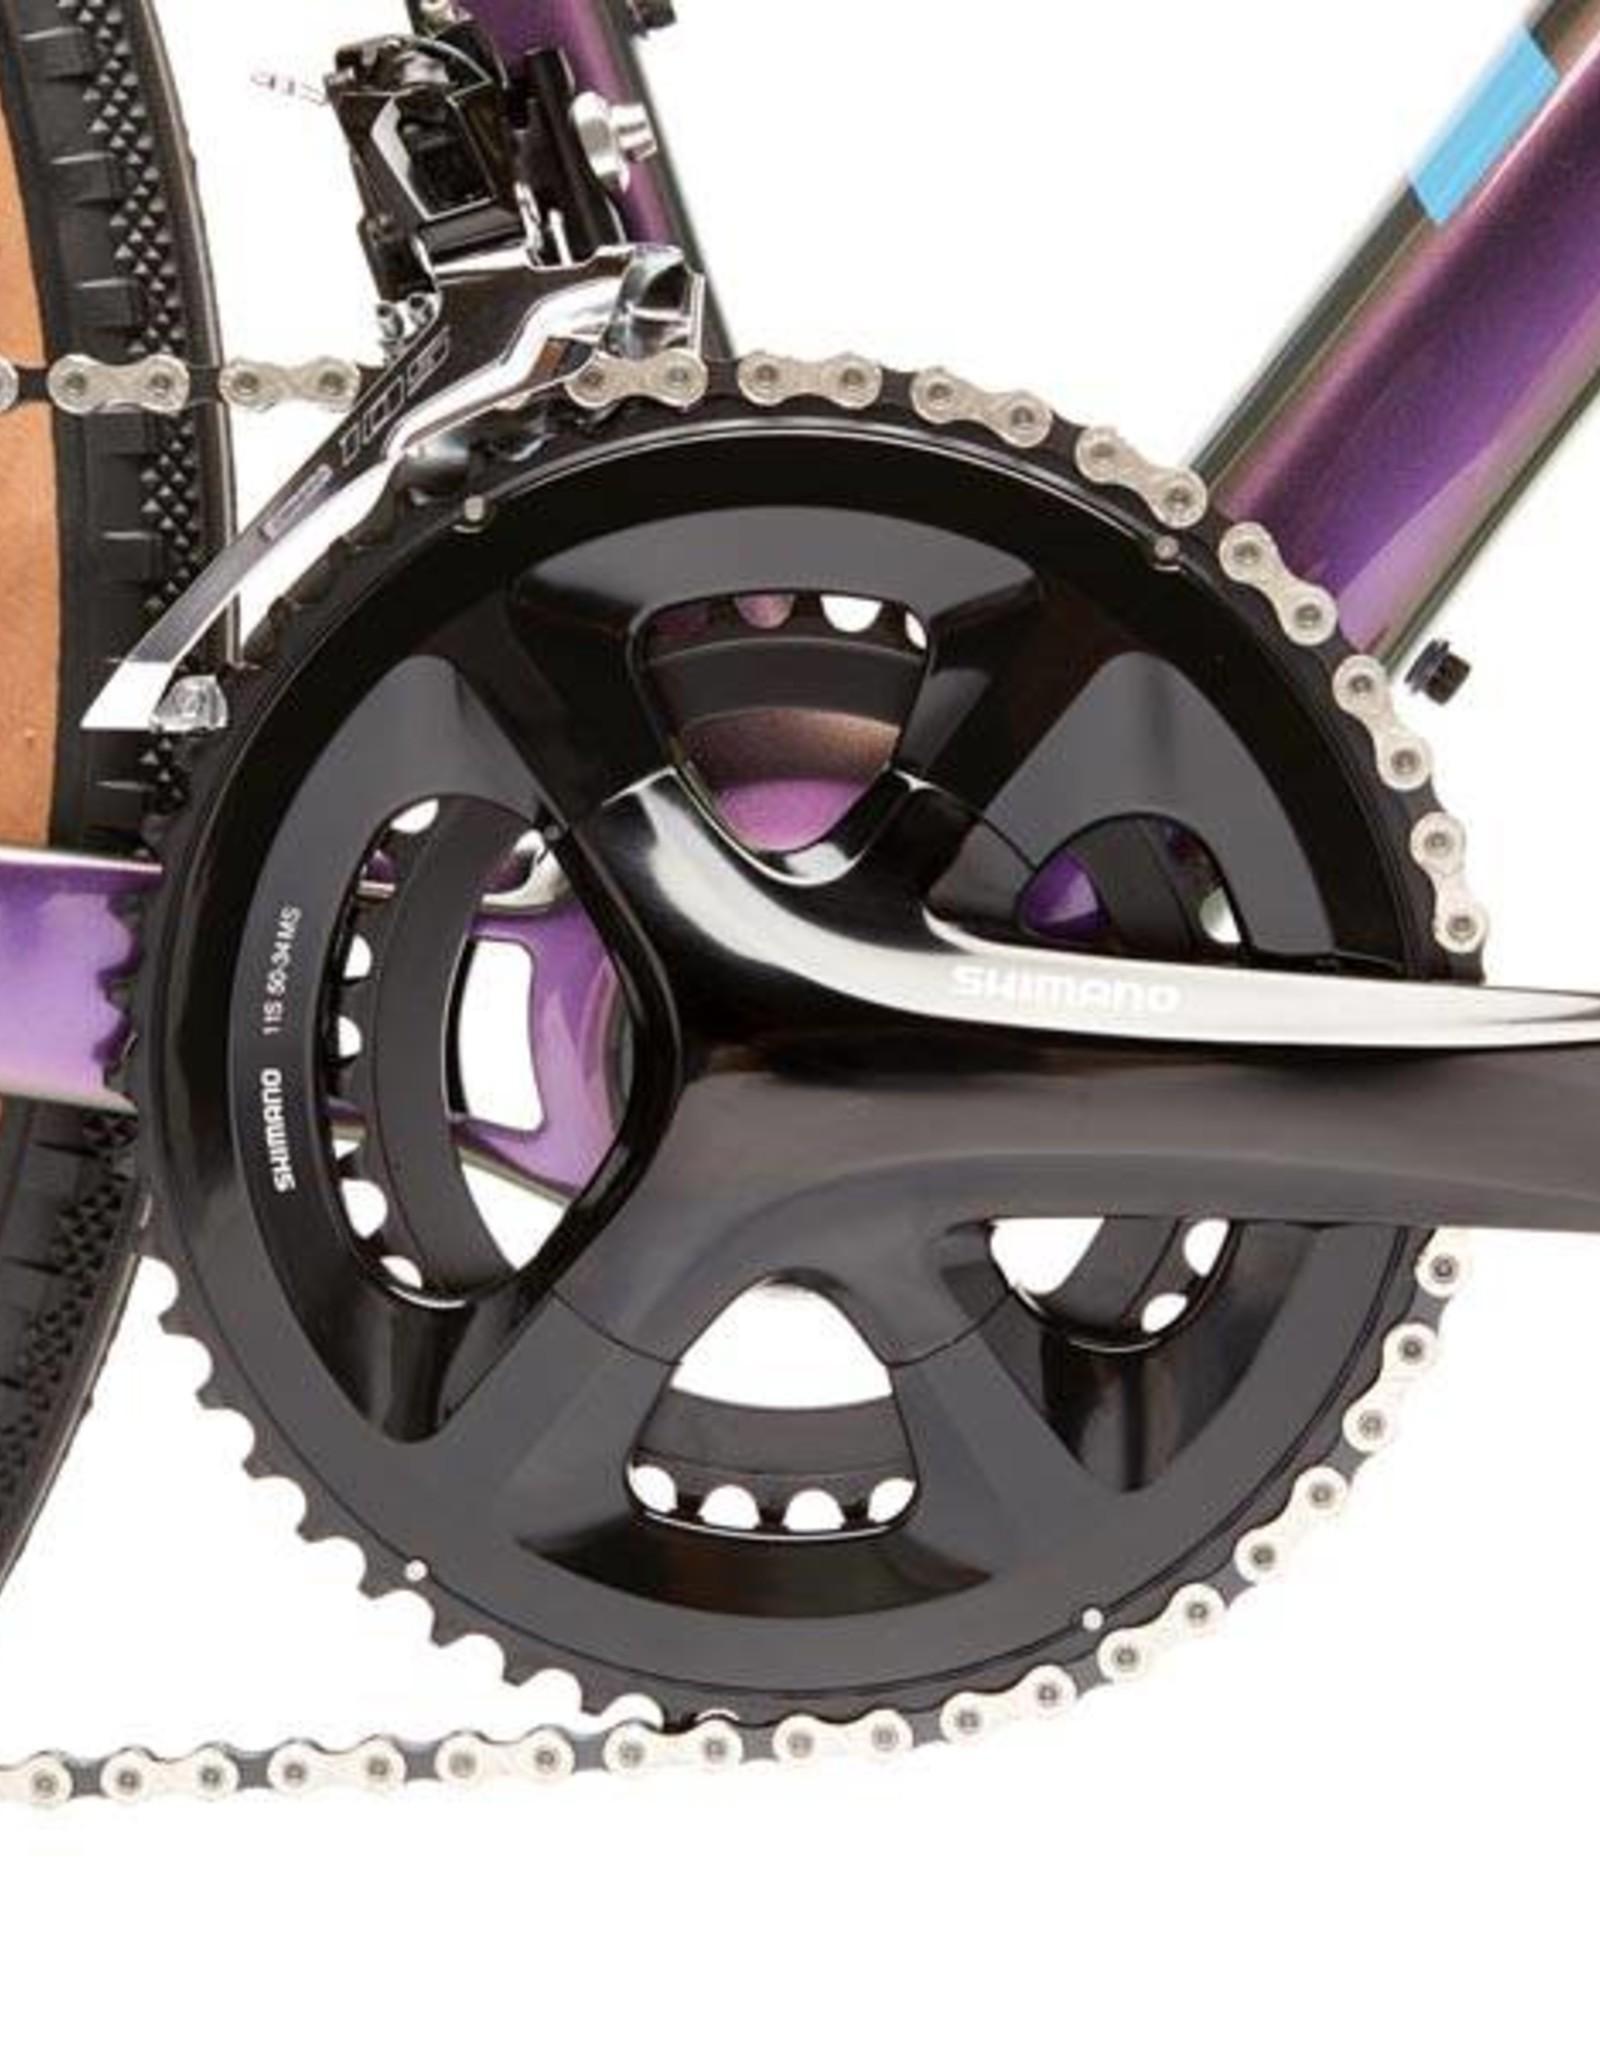 Kona Bicycles Kona Libre Ultegra (2019)